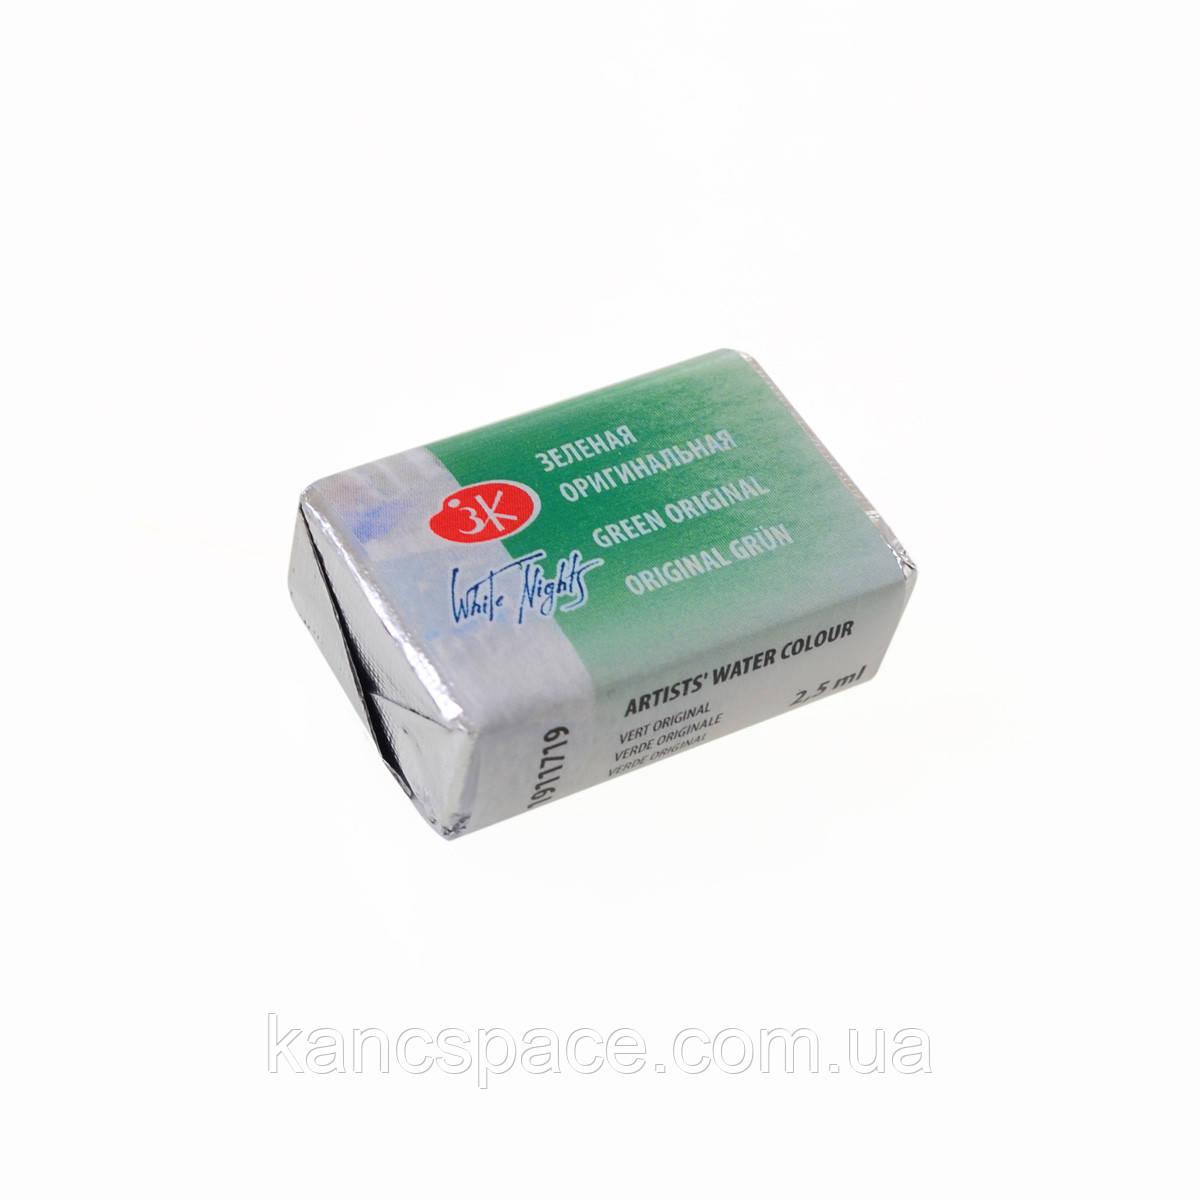 Фарба акварельна КЮВЕТА, зелена оригинальнаа, 2.5мл ЗХК